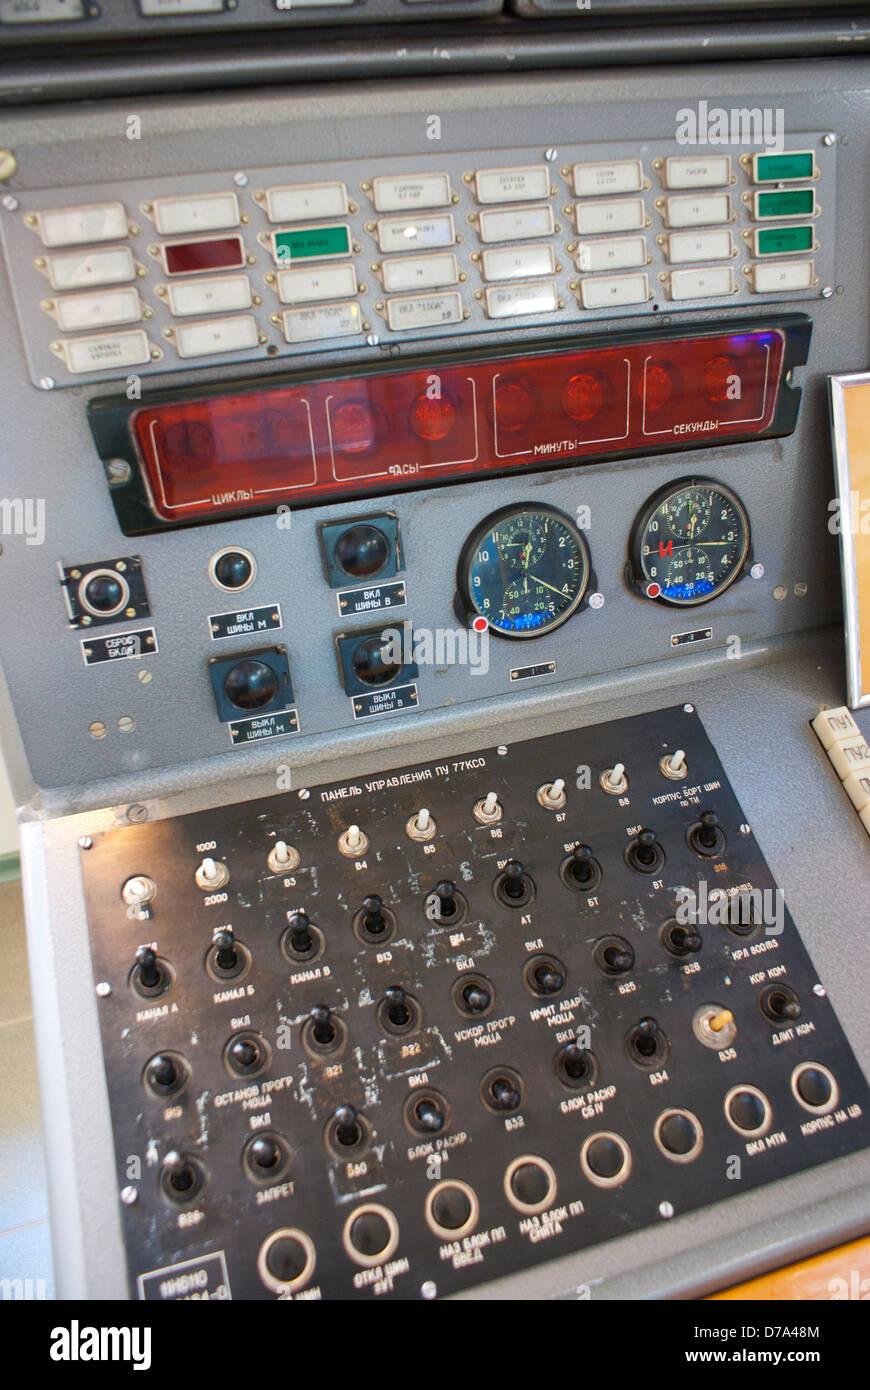 Launch control console in Baikonur Cosmodrome Kazakhstan - Stock Image